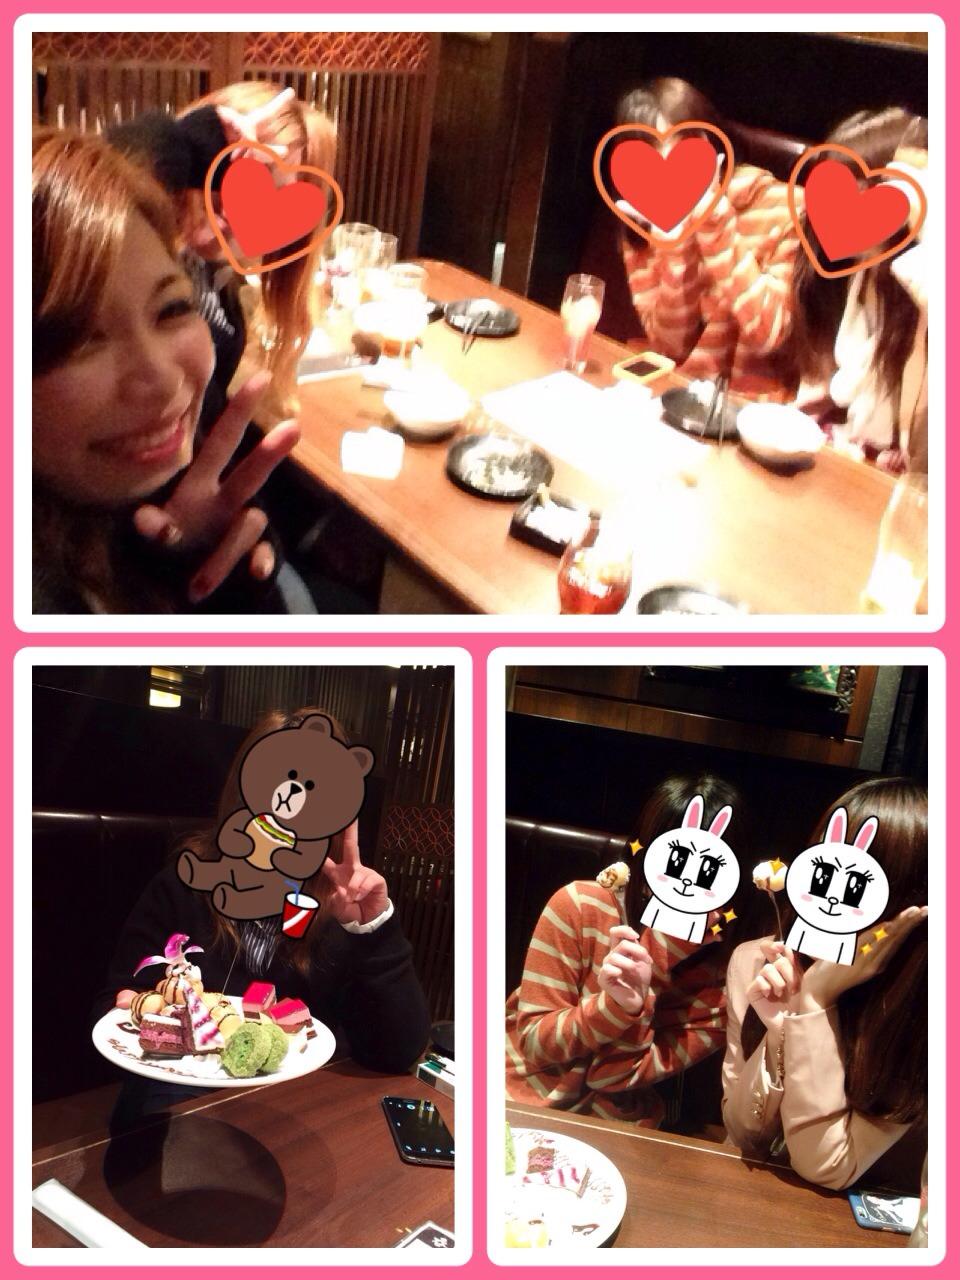 S__3219462.jpg